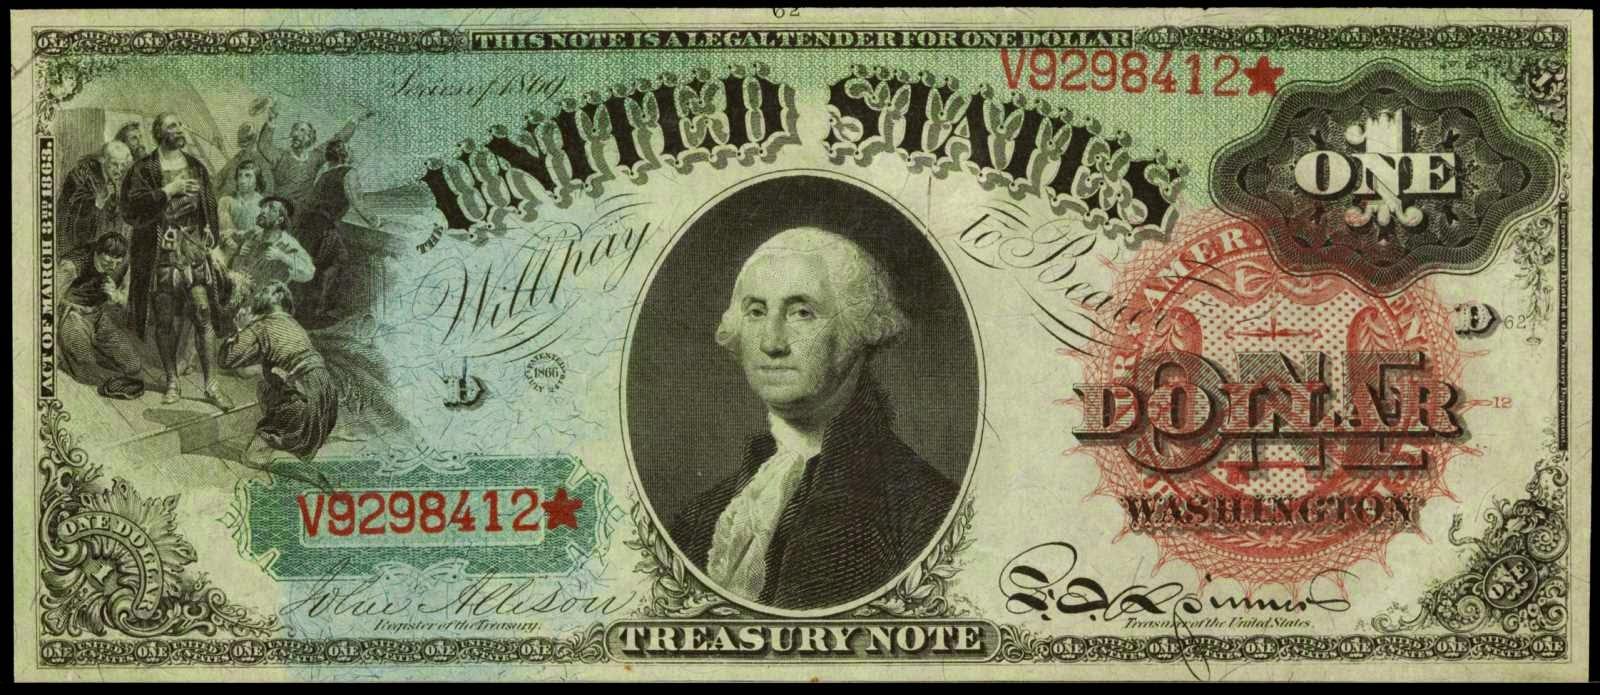 1869 One Dollar Bill Legal Tender Rainbow Notes